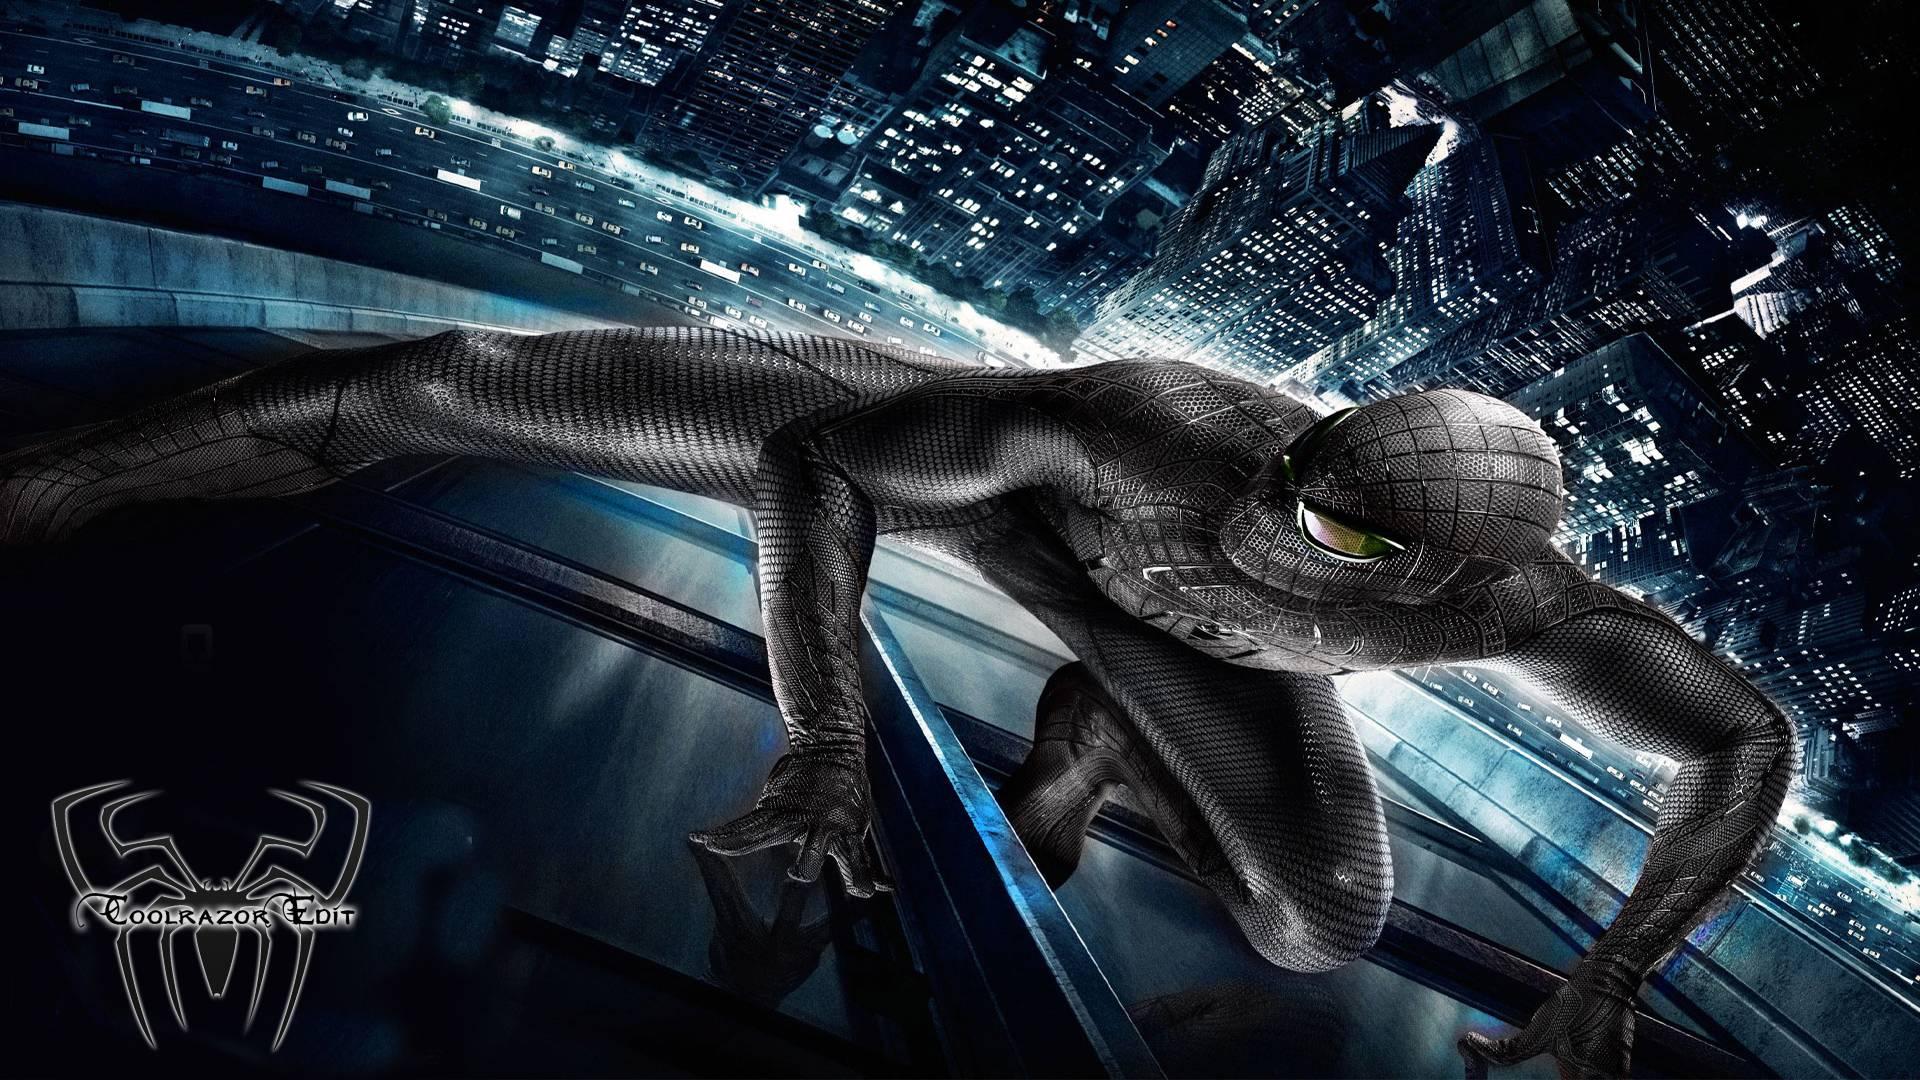 The Amazing Spiderman HD Wallpaper   Imgur 1920x1080